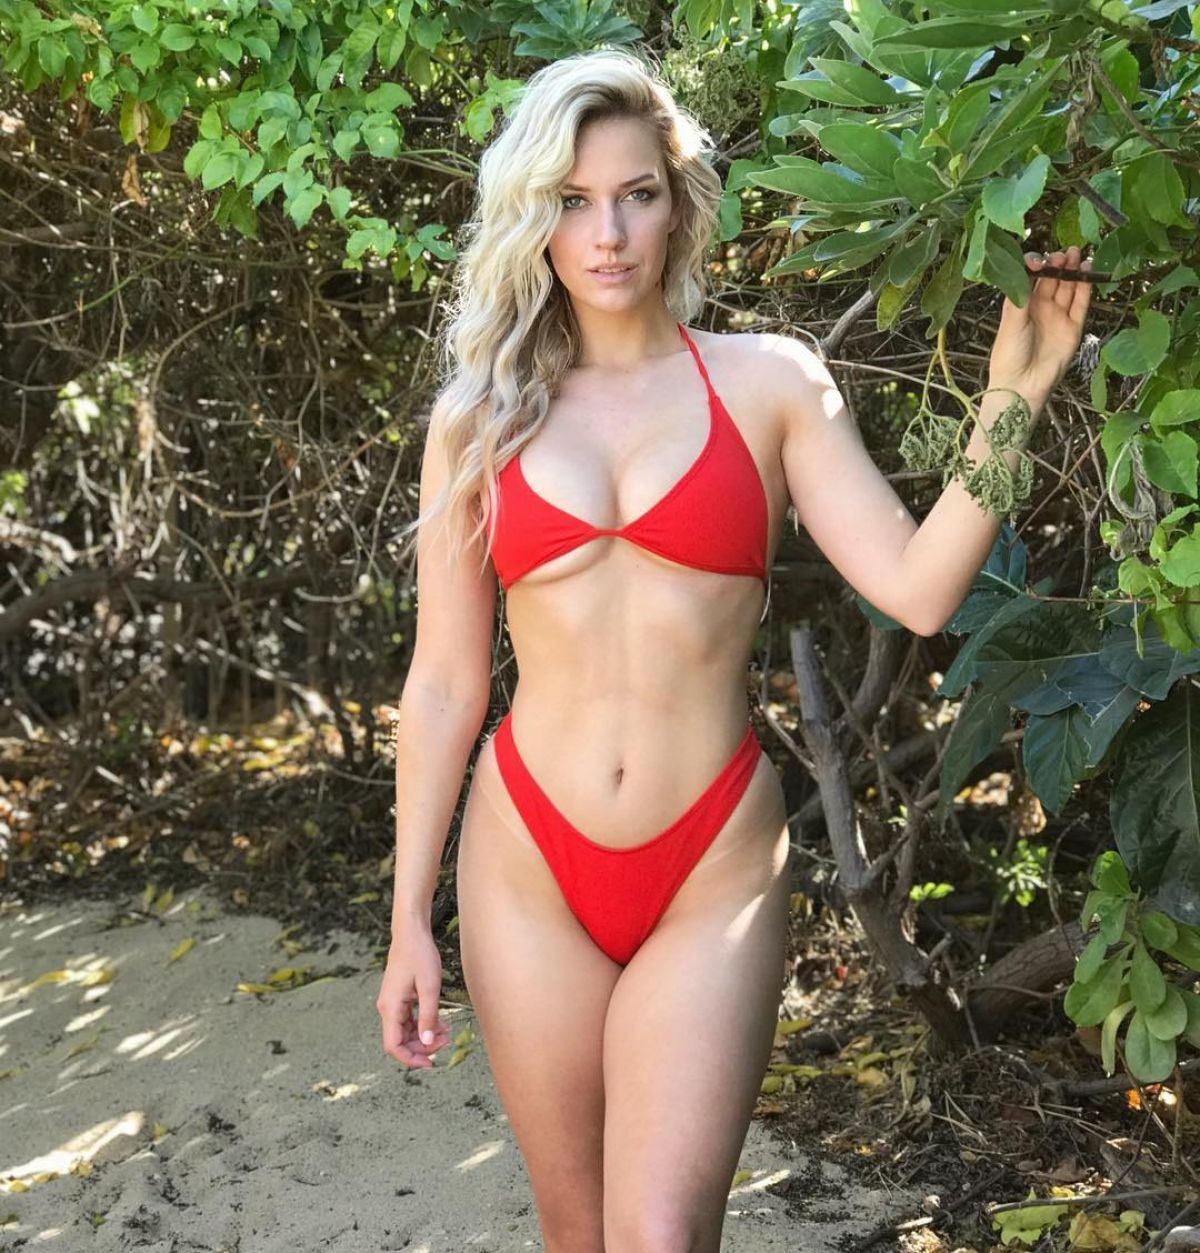 Paige Spiranacs sexiest bikini photos | New York Post